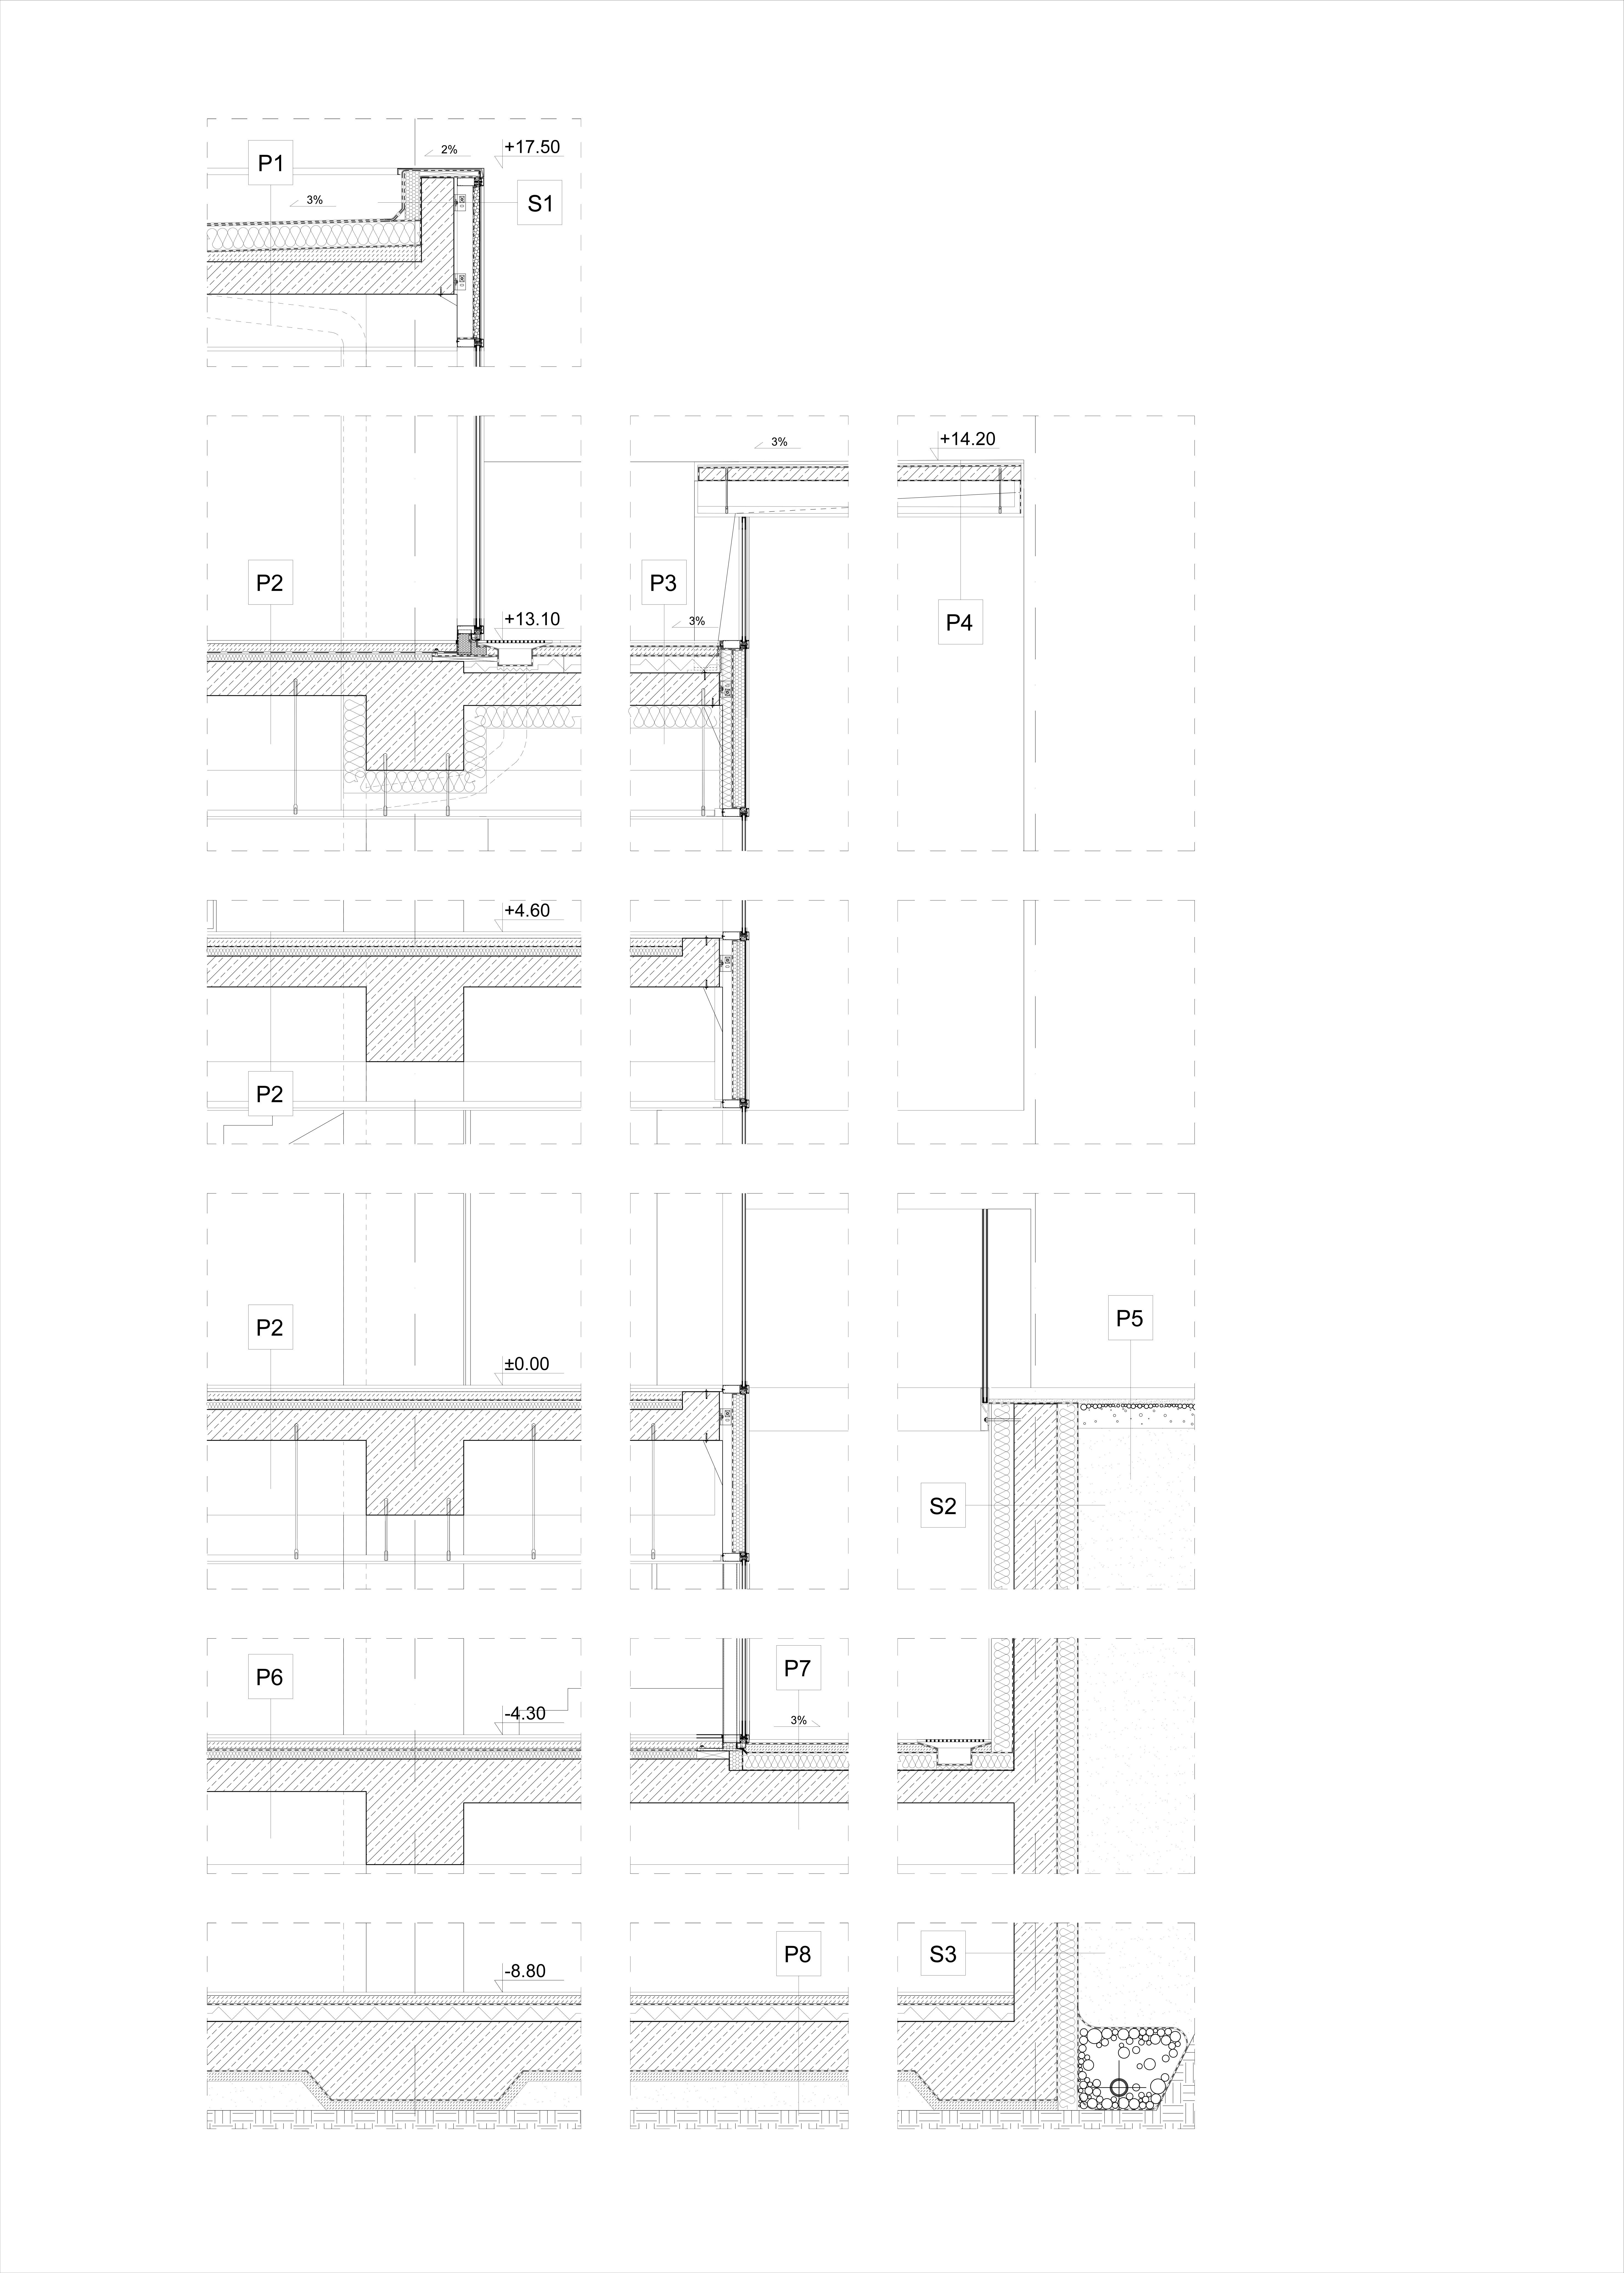 /Users/Sonia/Documents/Studia/Rok IV/Inżynierka/Cad/03.02/Detal